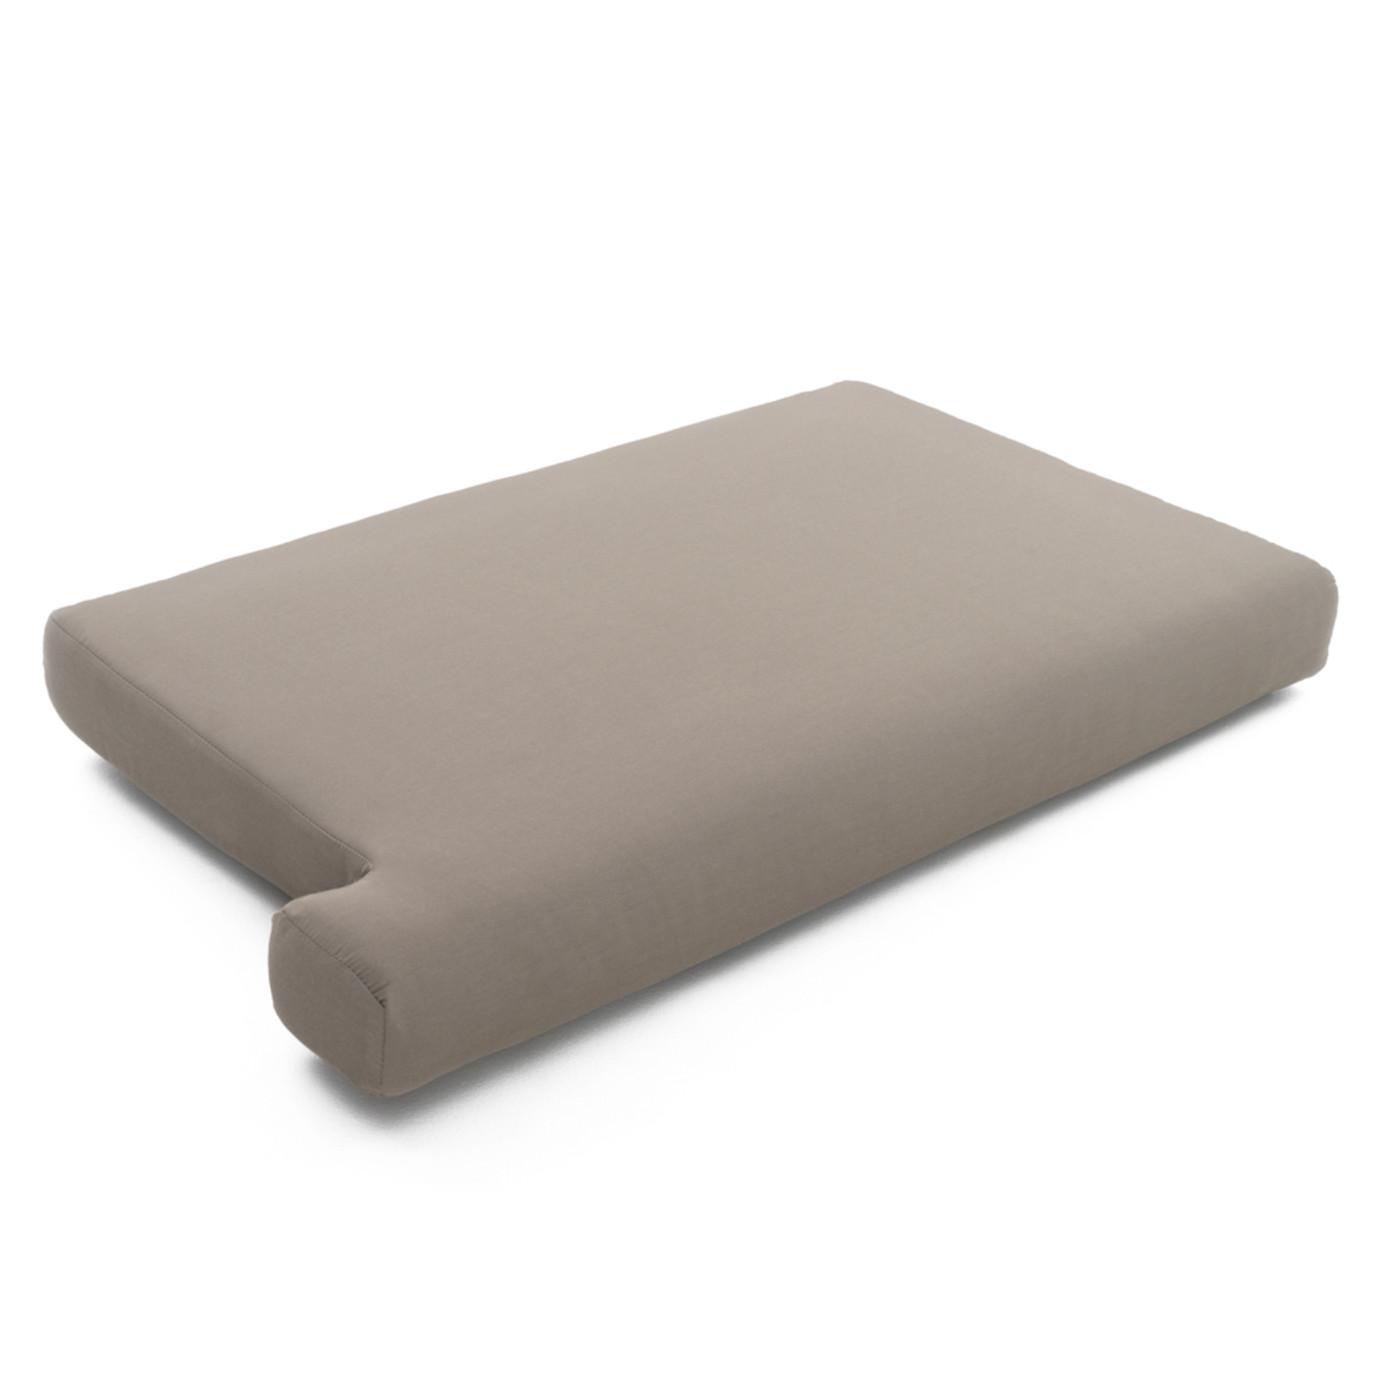 Portofino™ Comfort 96in Sofa Right Base Cushion - Kona Taupe